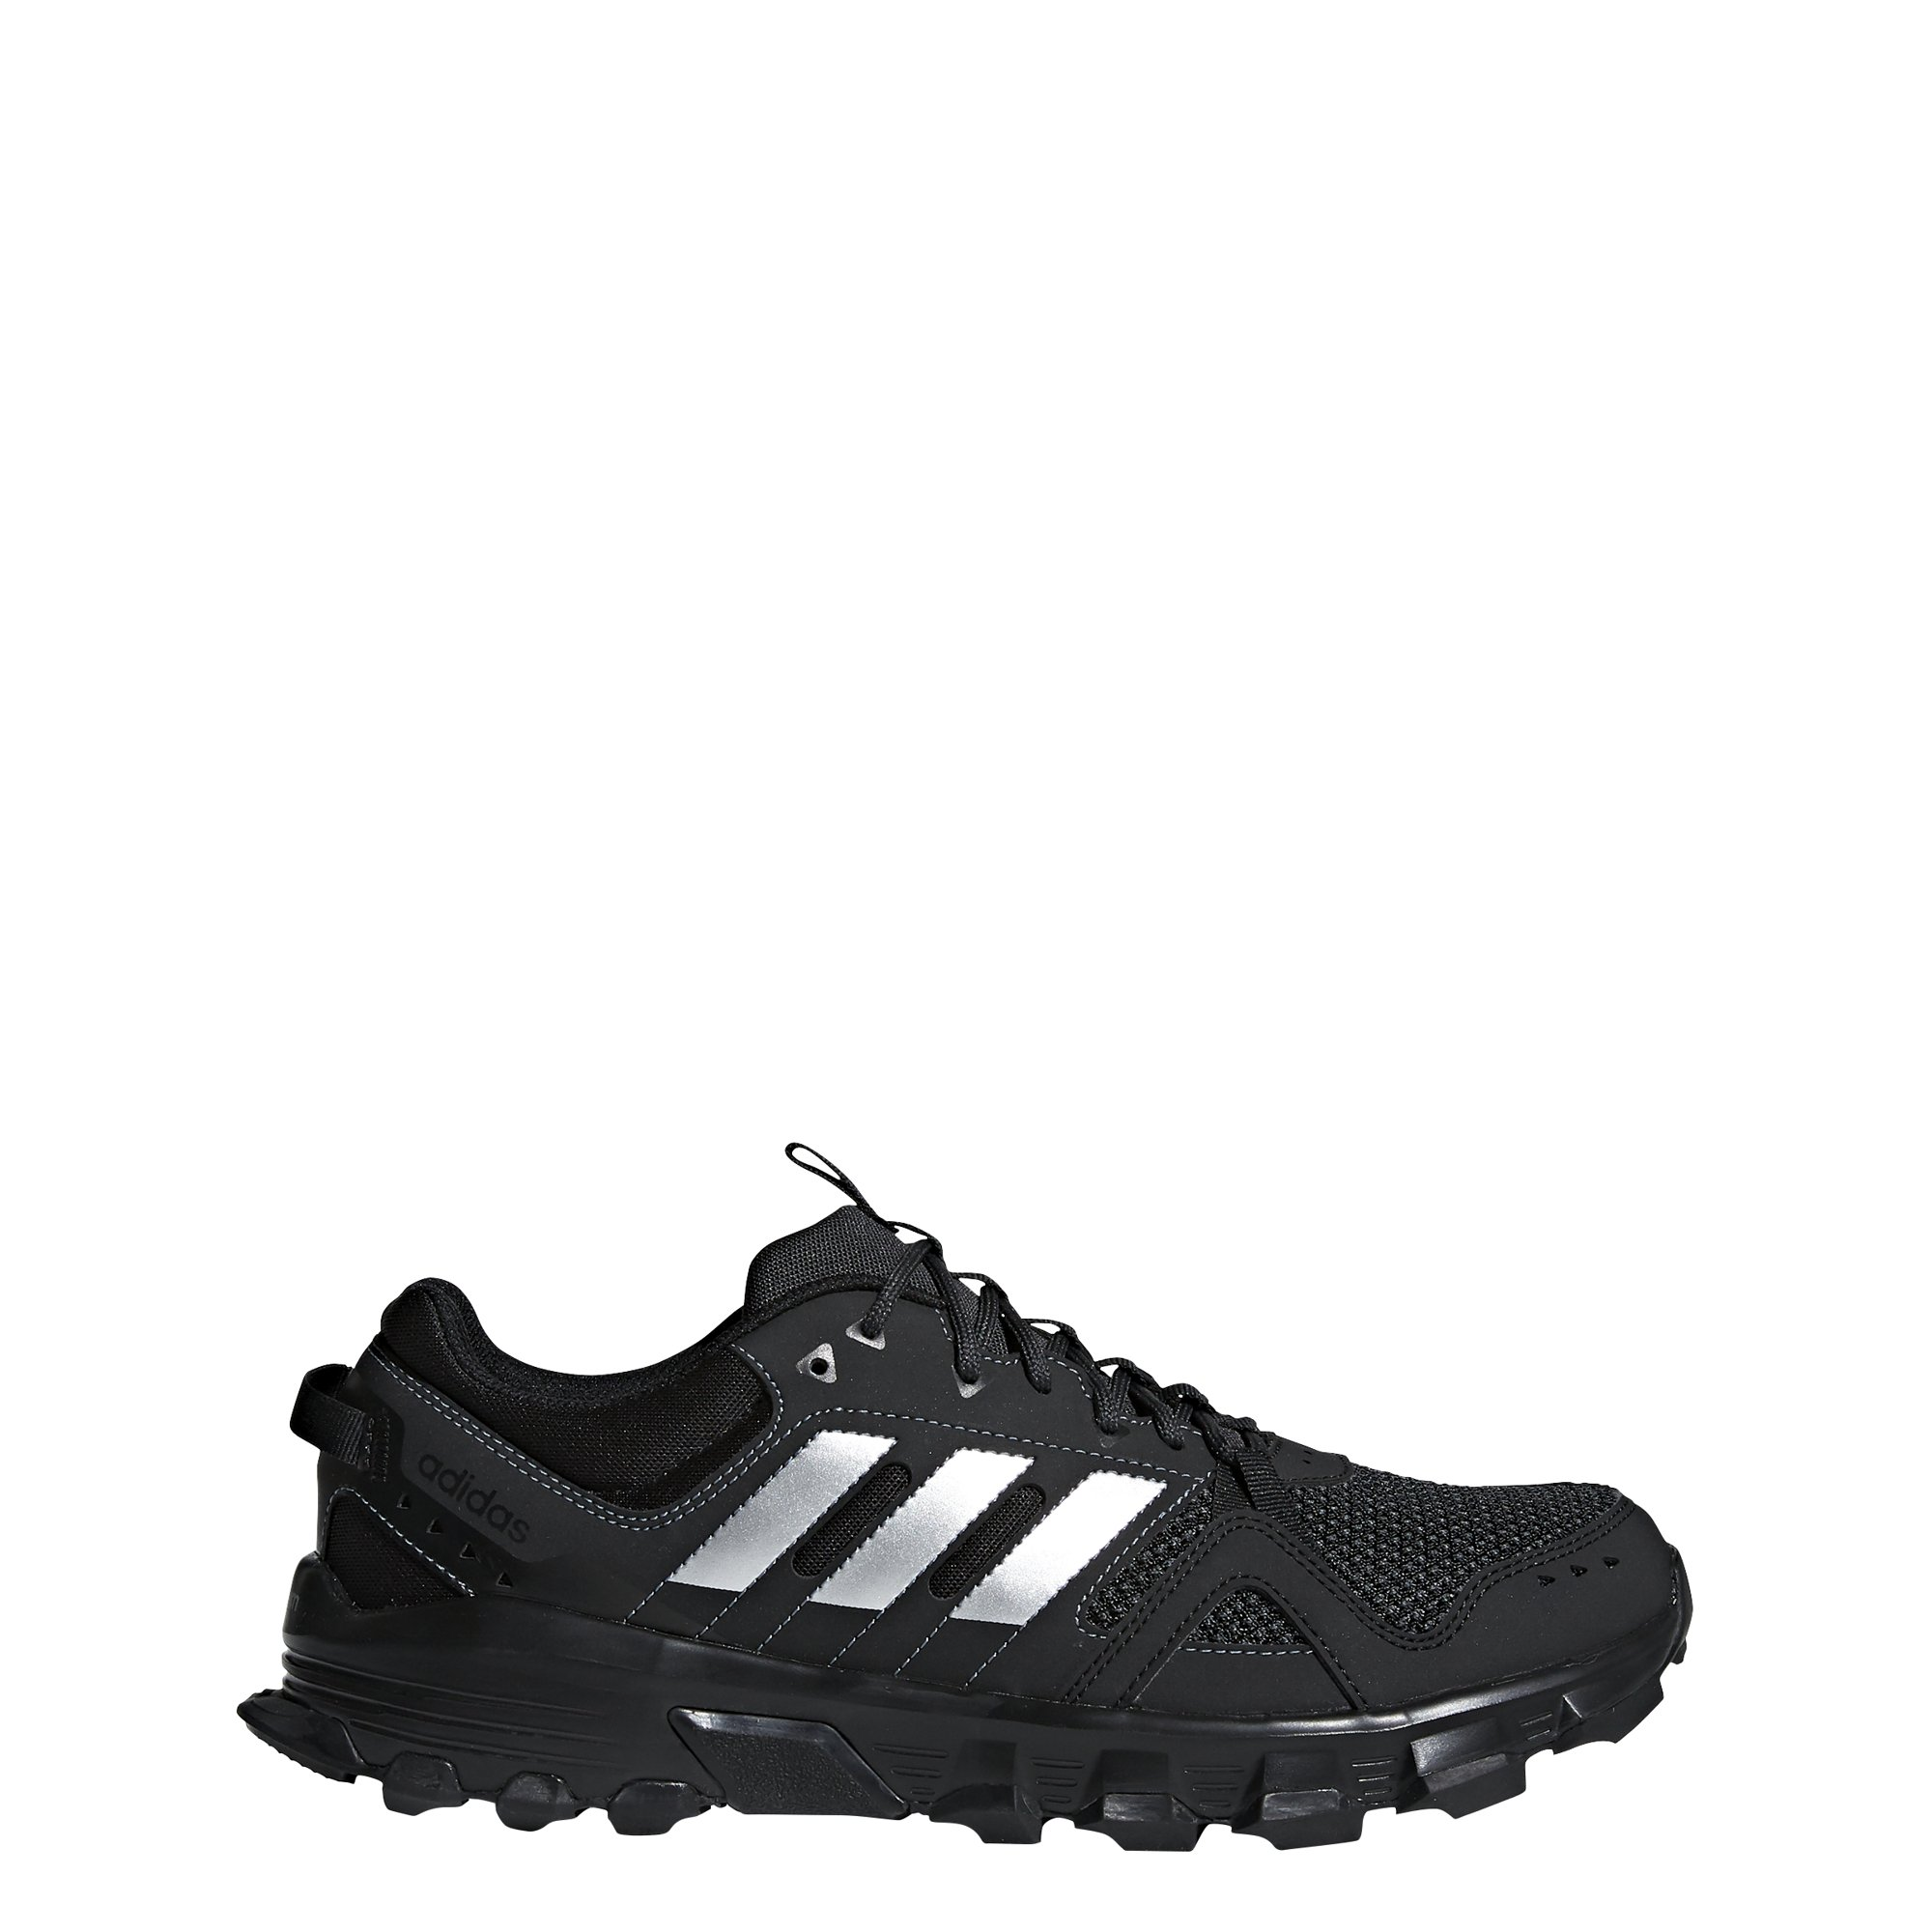 adidas Men's Rockadia m Trail Running Shoe, Core Black/Matte Silver/Carbon, 11 M US